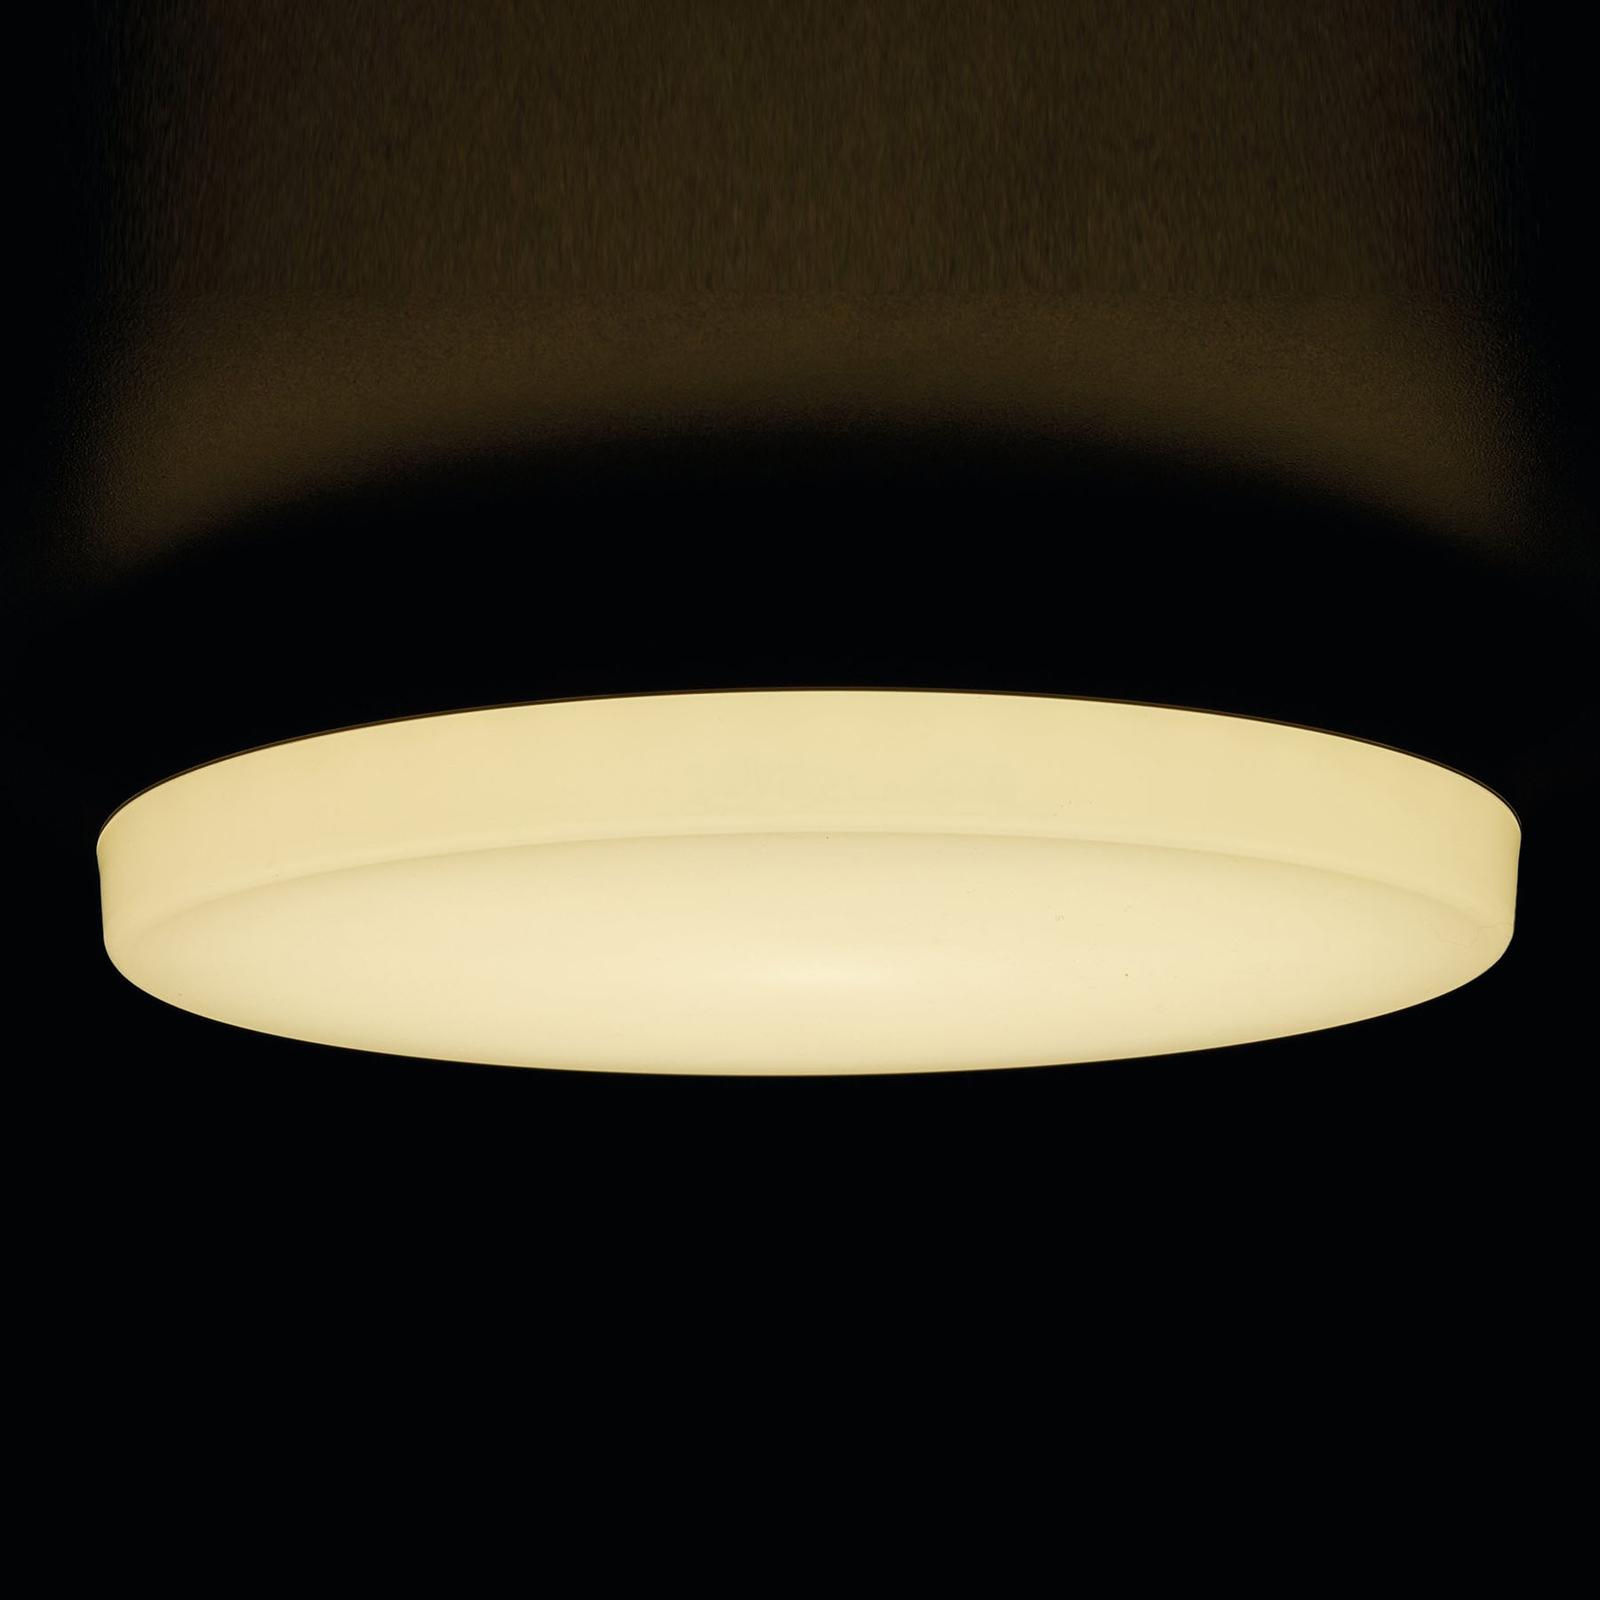 LED-kattovalaisin Pronto Ø 28 cm